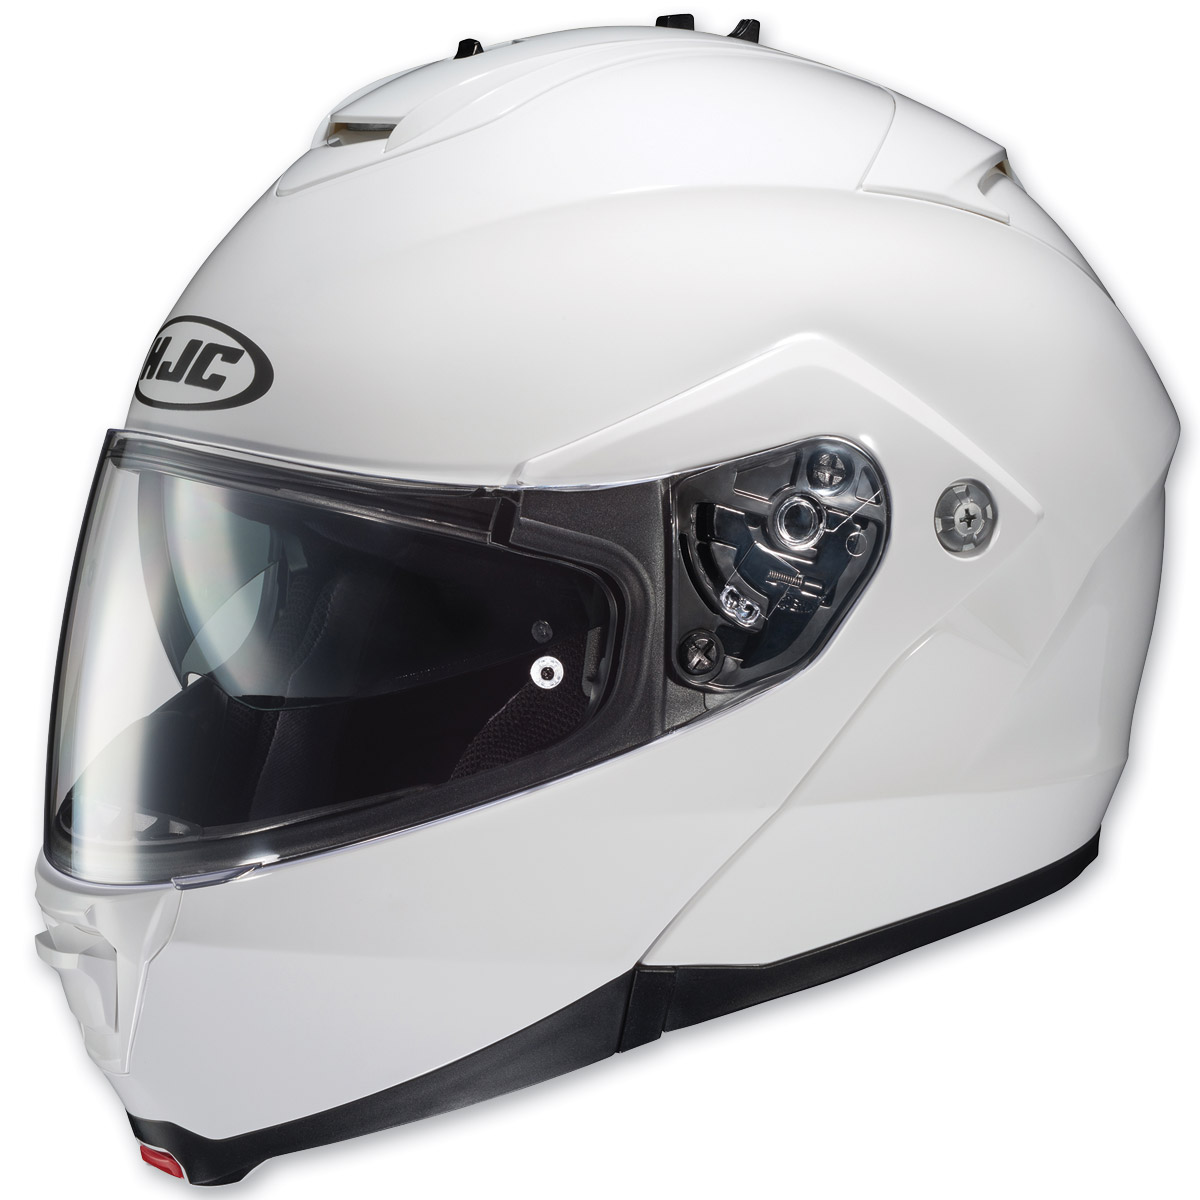 HJC IS-MAX II White Modular Helmet